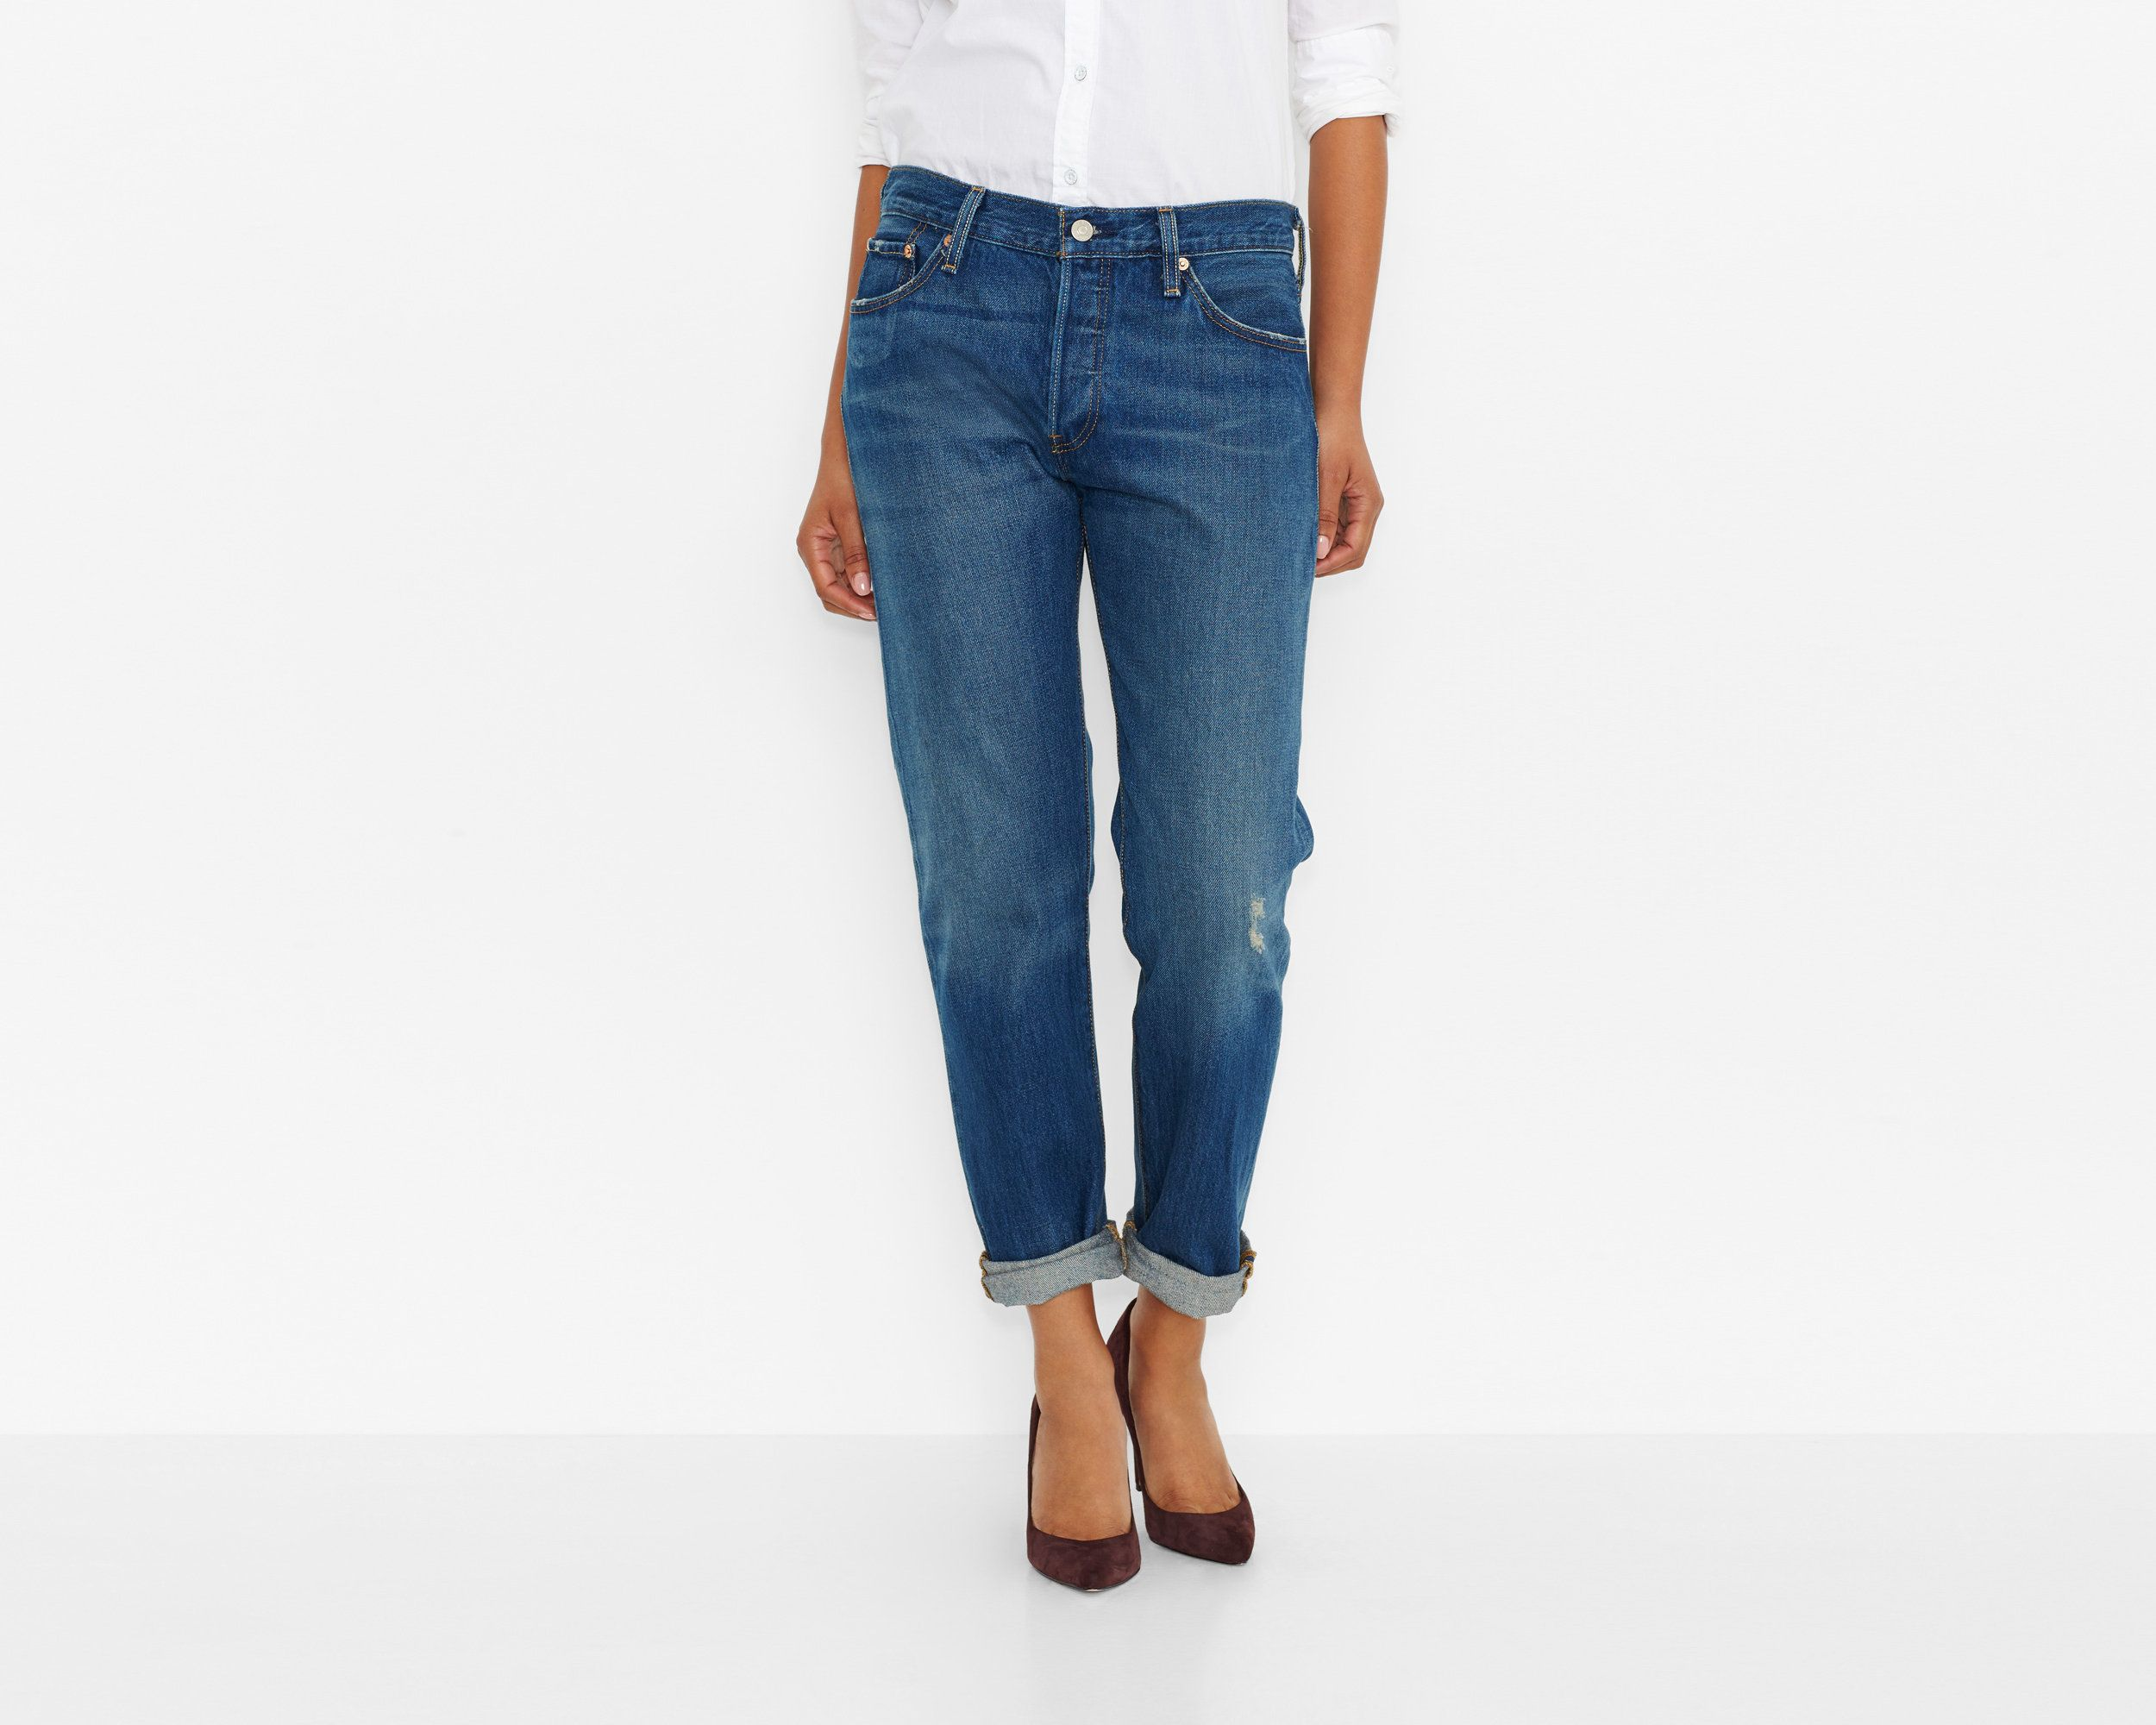 Women's Low Waist Bodycon Elastic Denim Pencil Jeans in ...